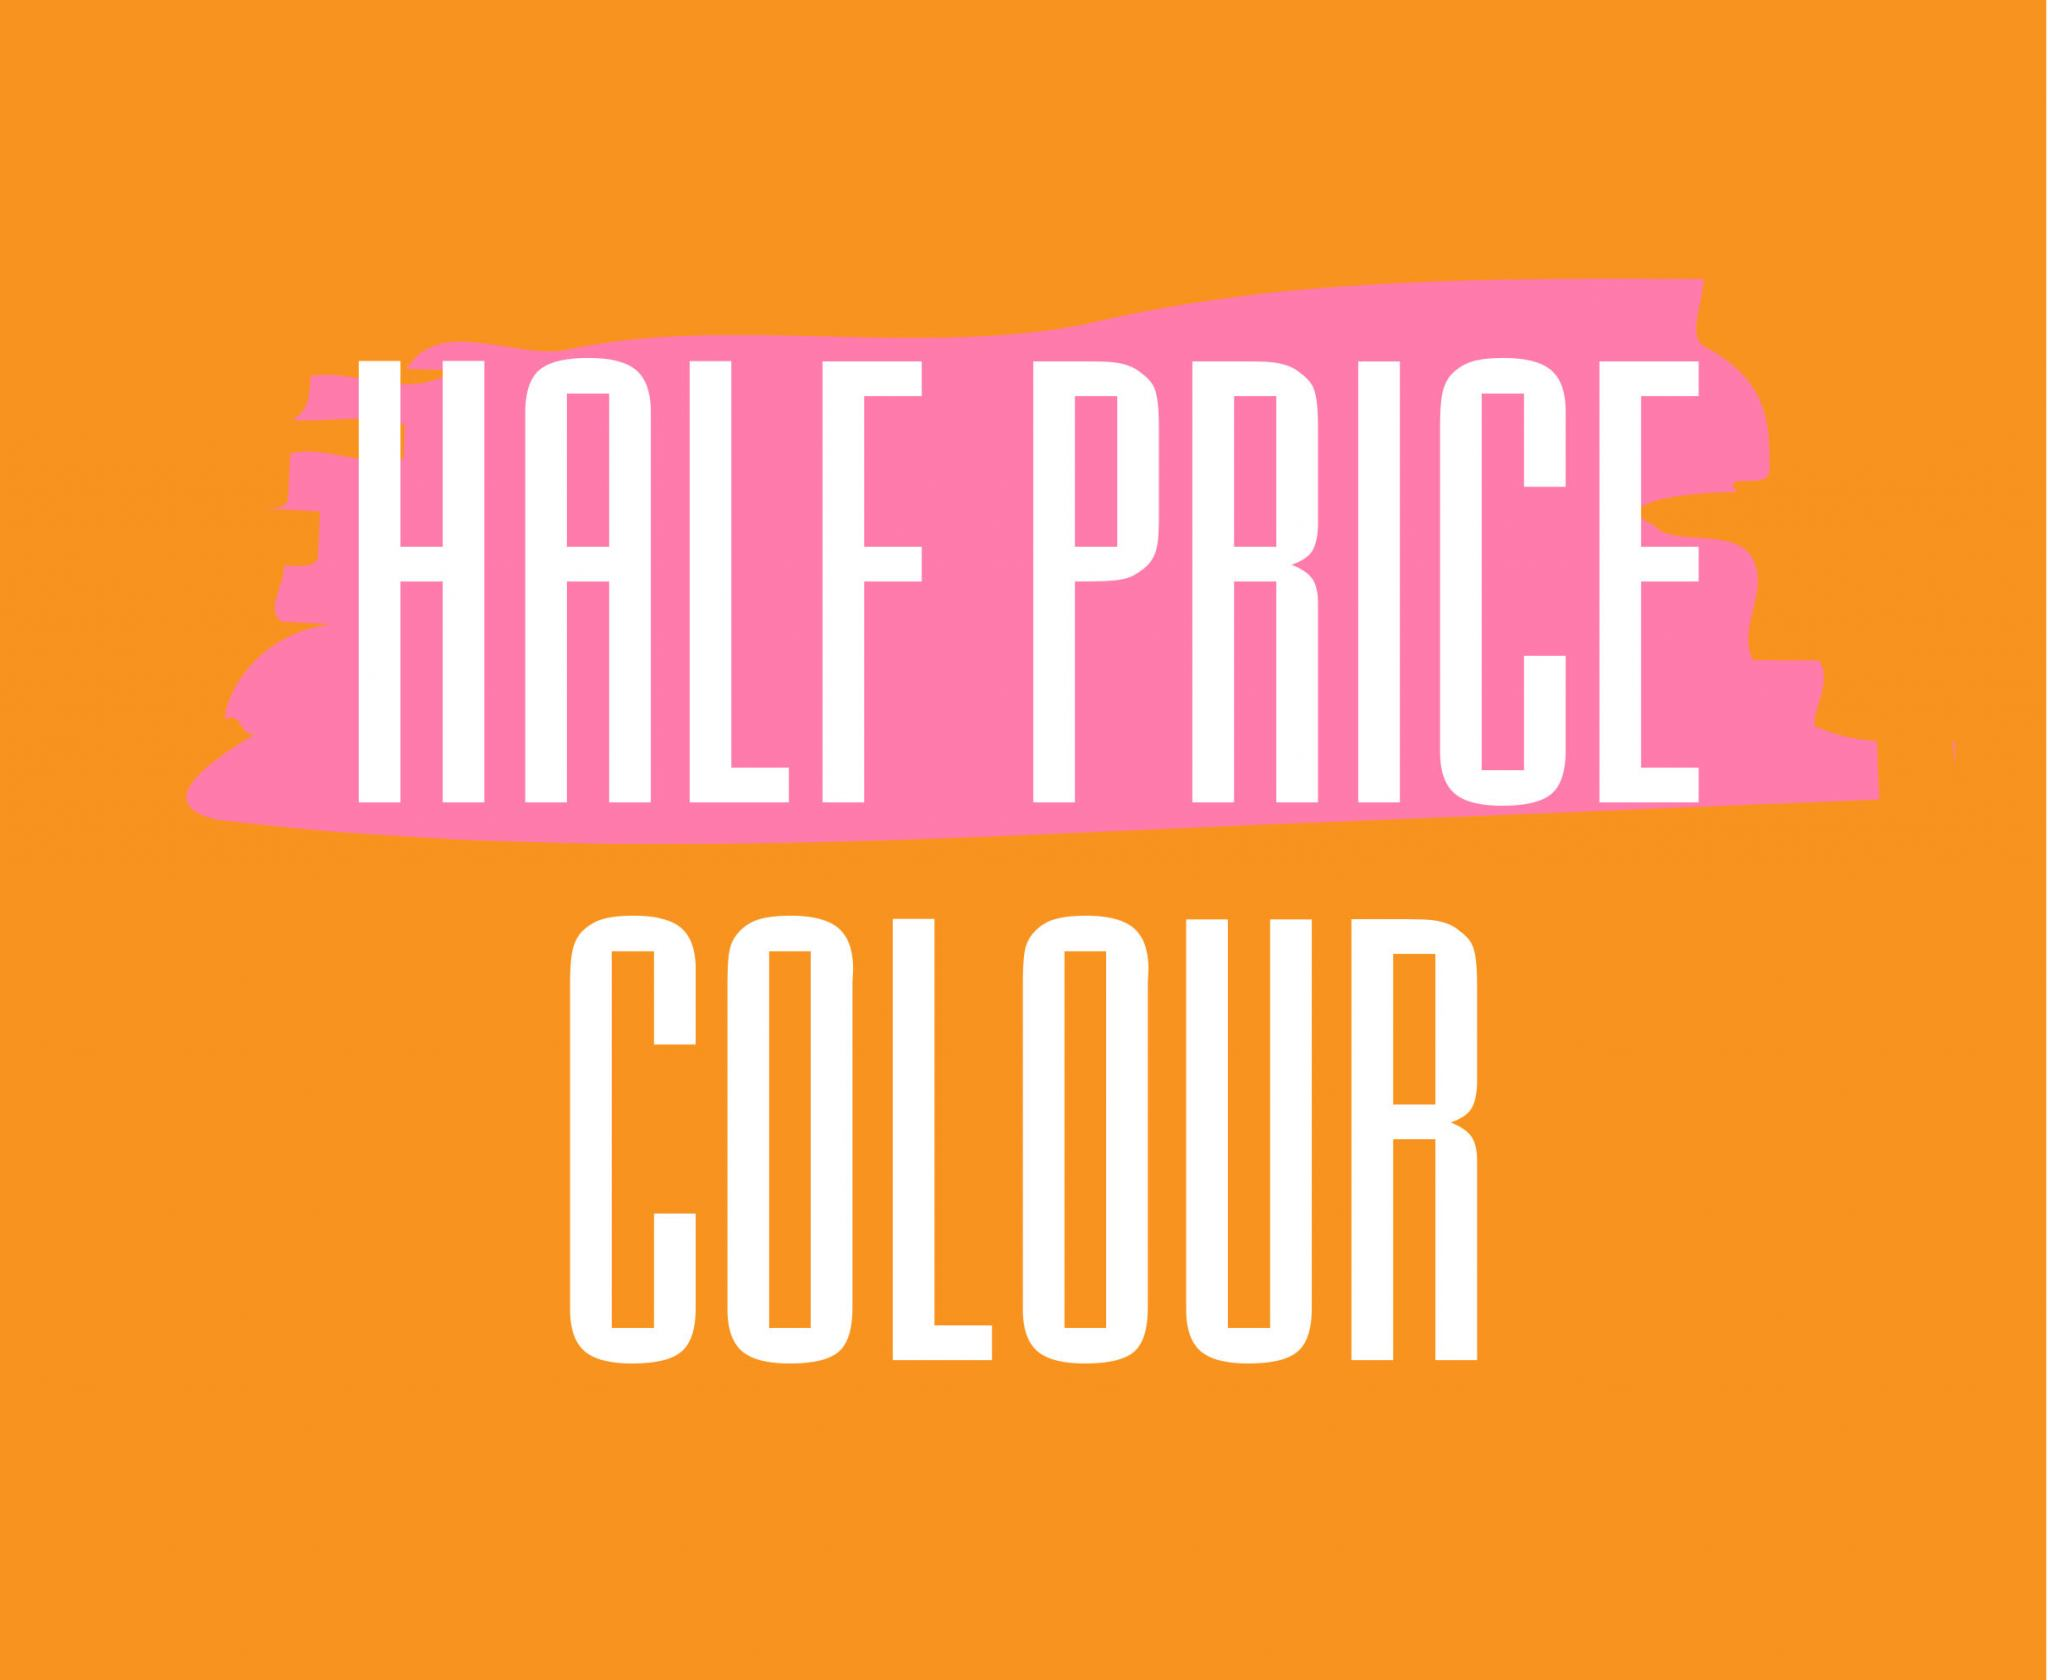 Half Price Colour Days